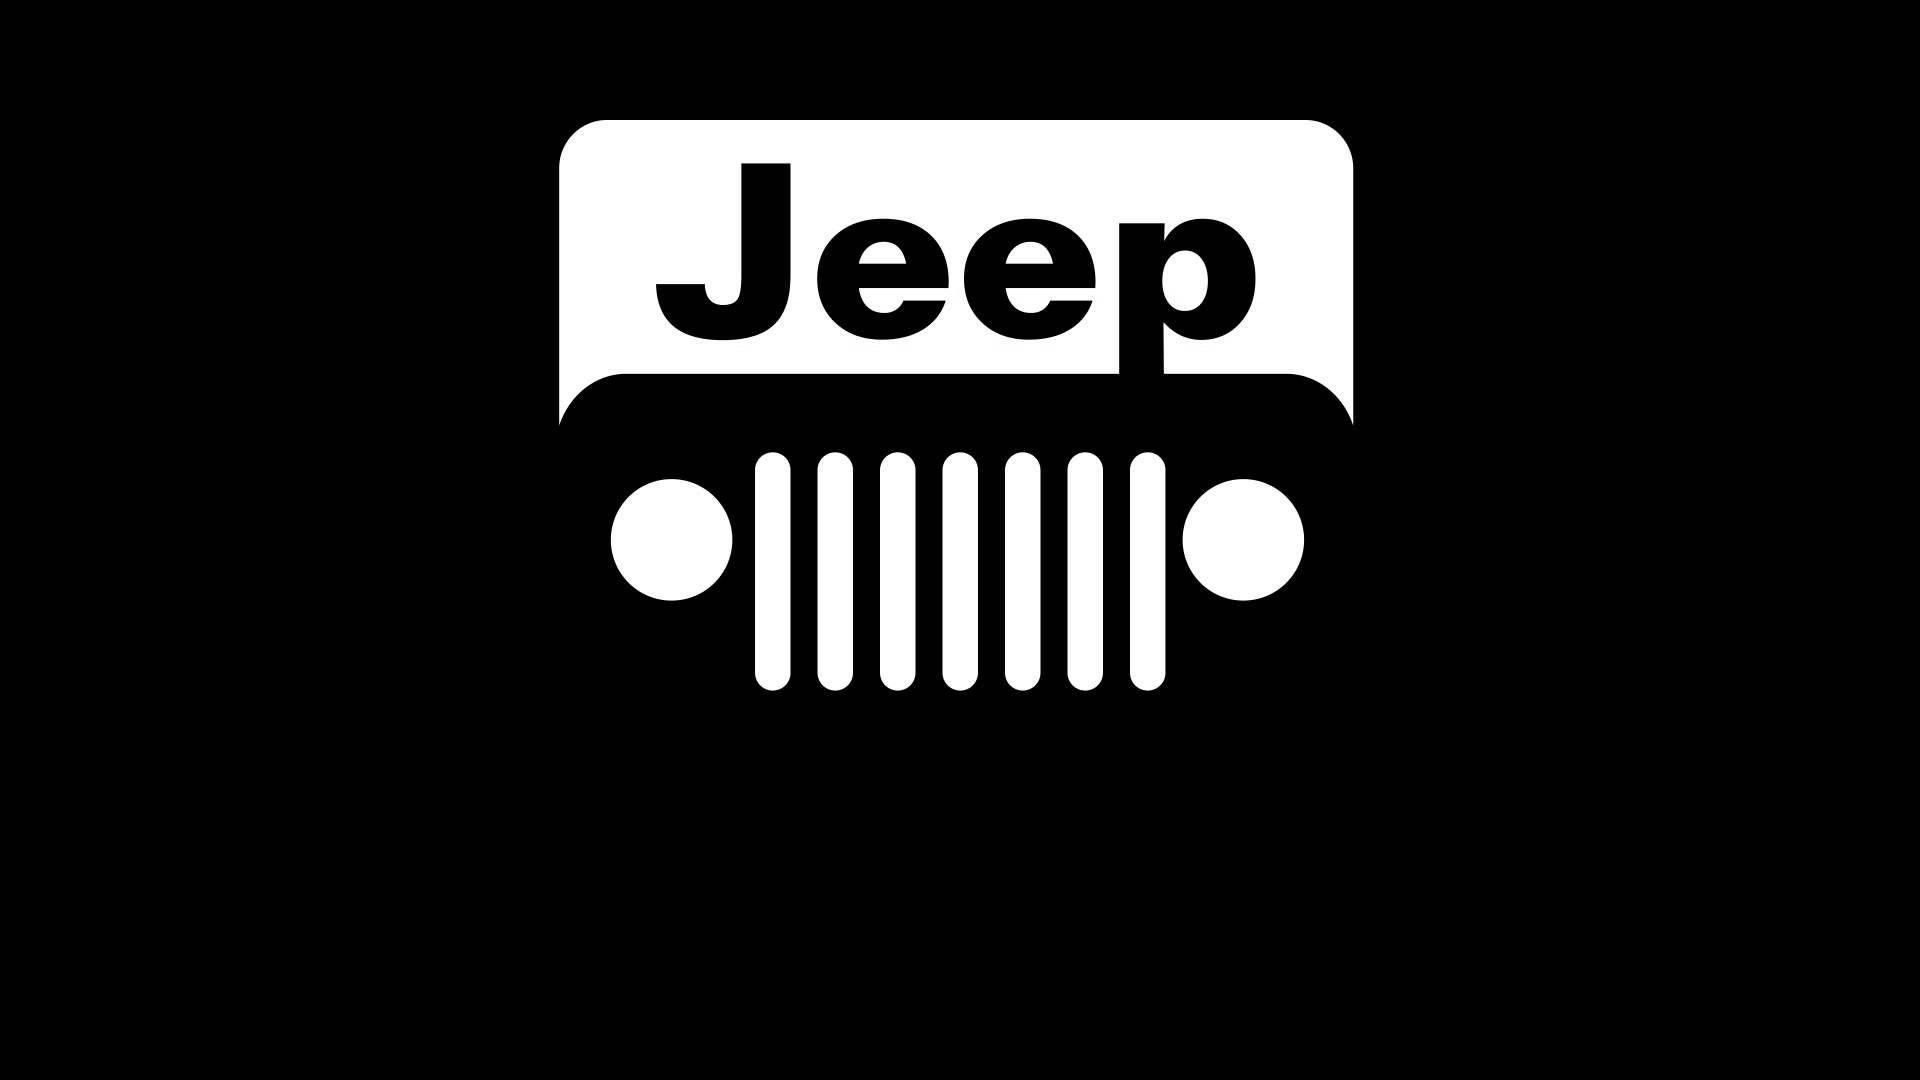 black jeep logo hd wallpaper 2429